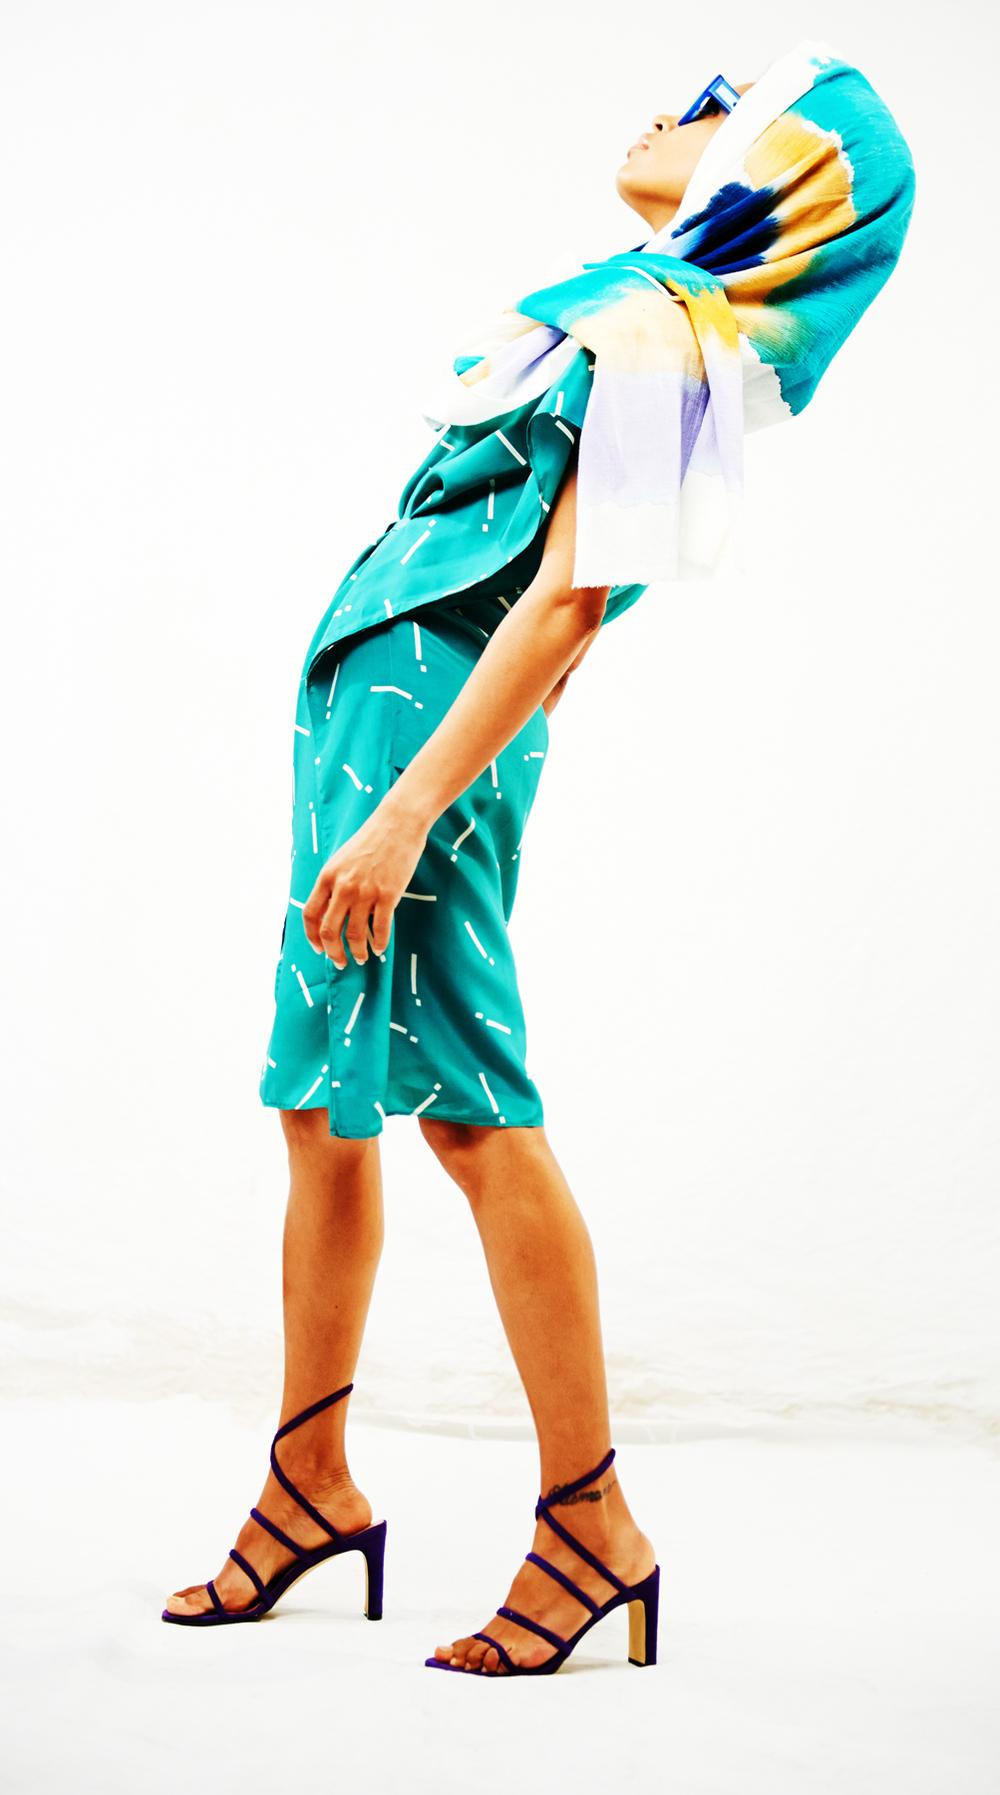 Linea Germania Dress and Scarf, Mengly Hernandez 6.jpg